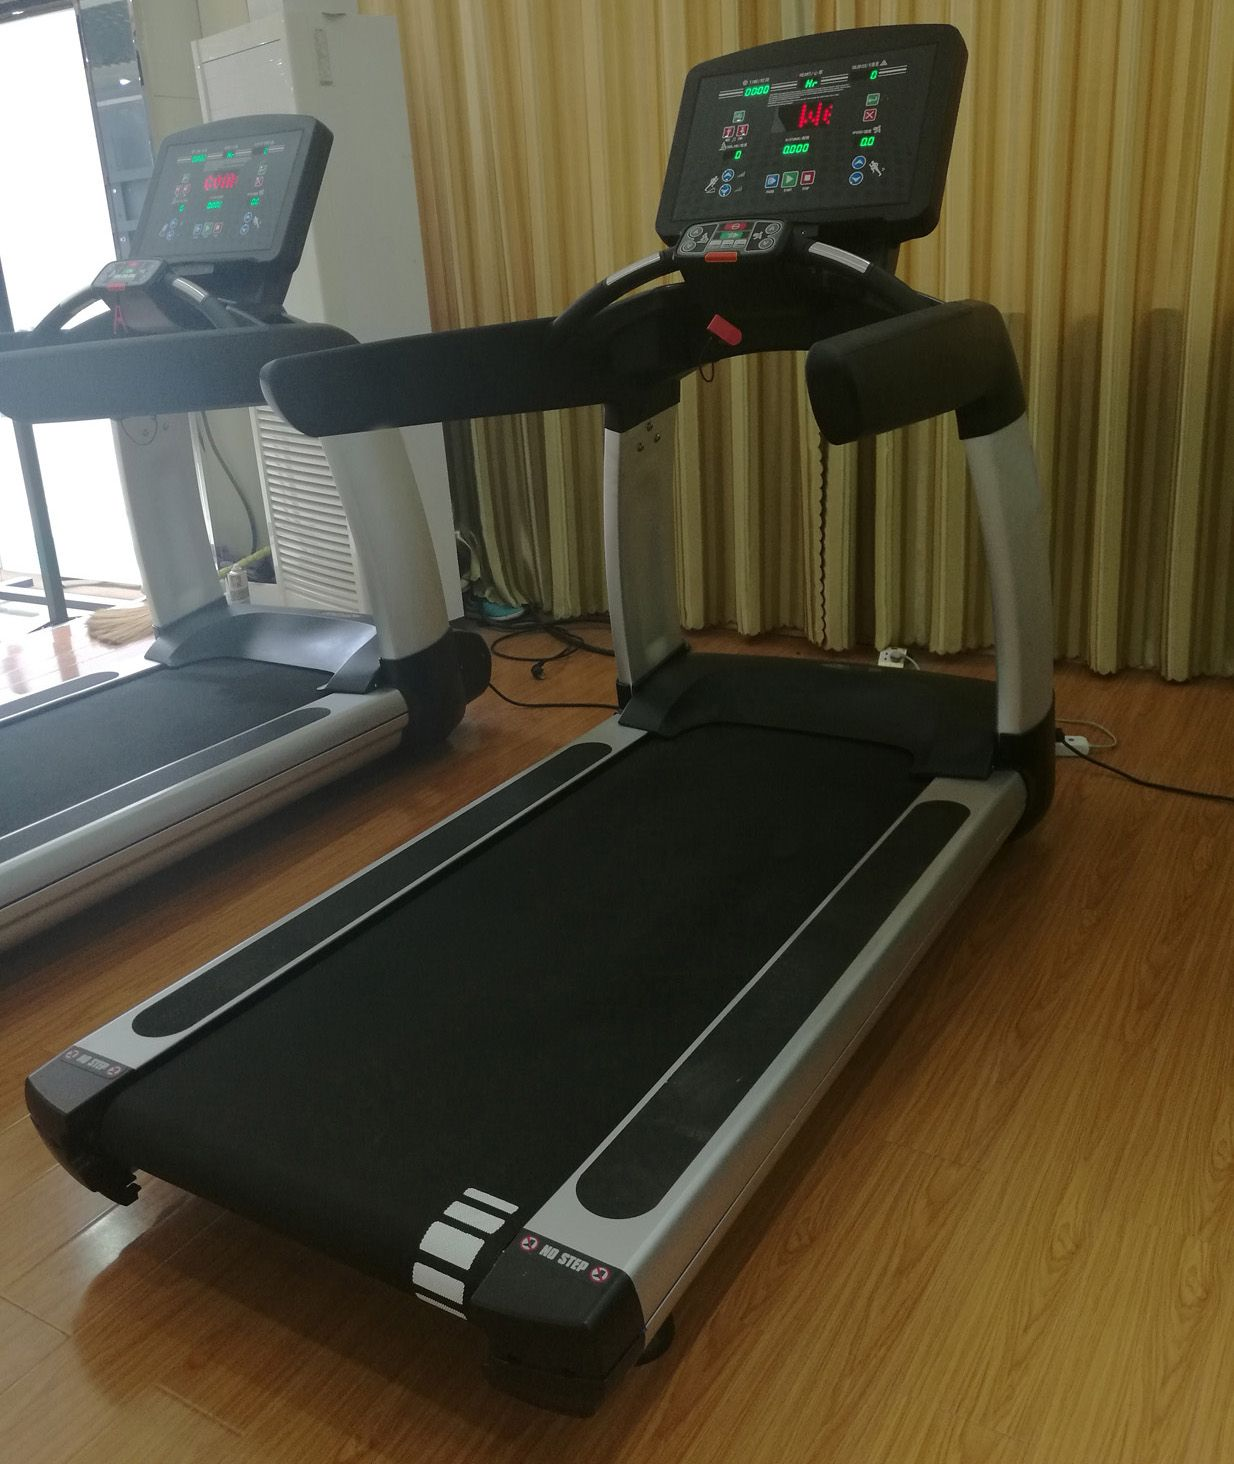 Lifefitness treadmill in 2020 treadmill fit life